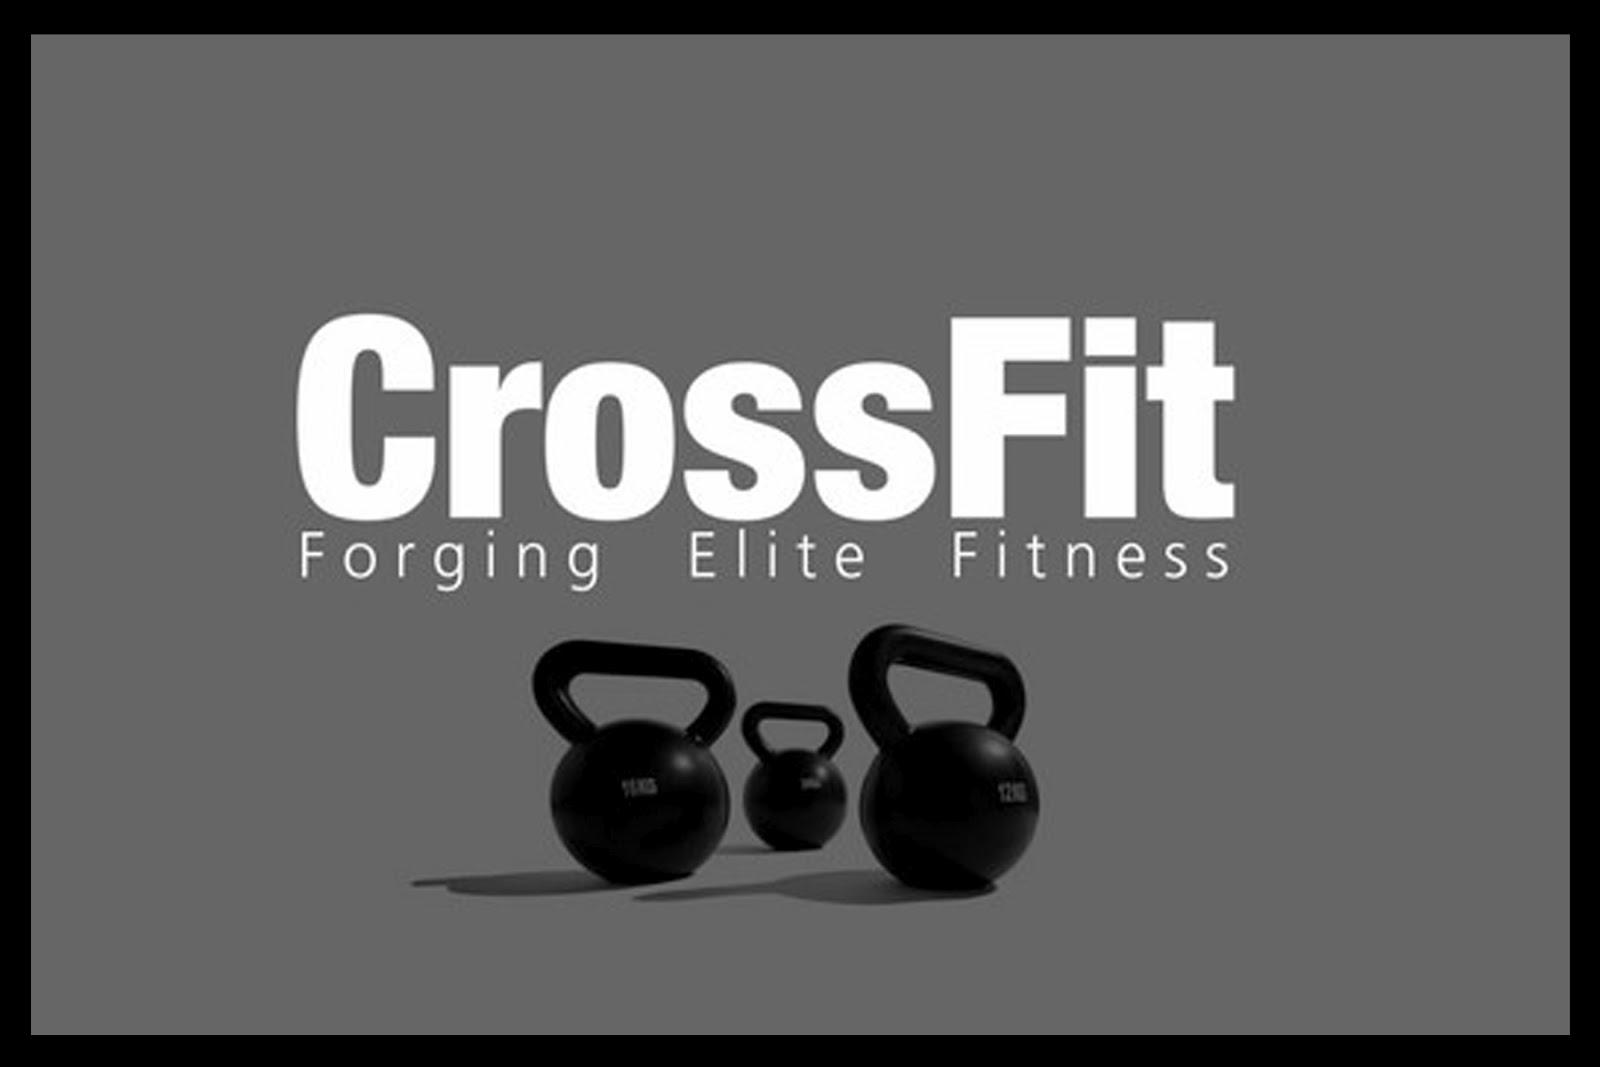 crossfit wallpapers NOVA Fitness Crossfit Rochester NY 1600x1067